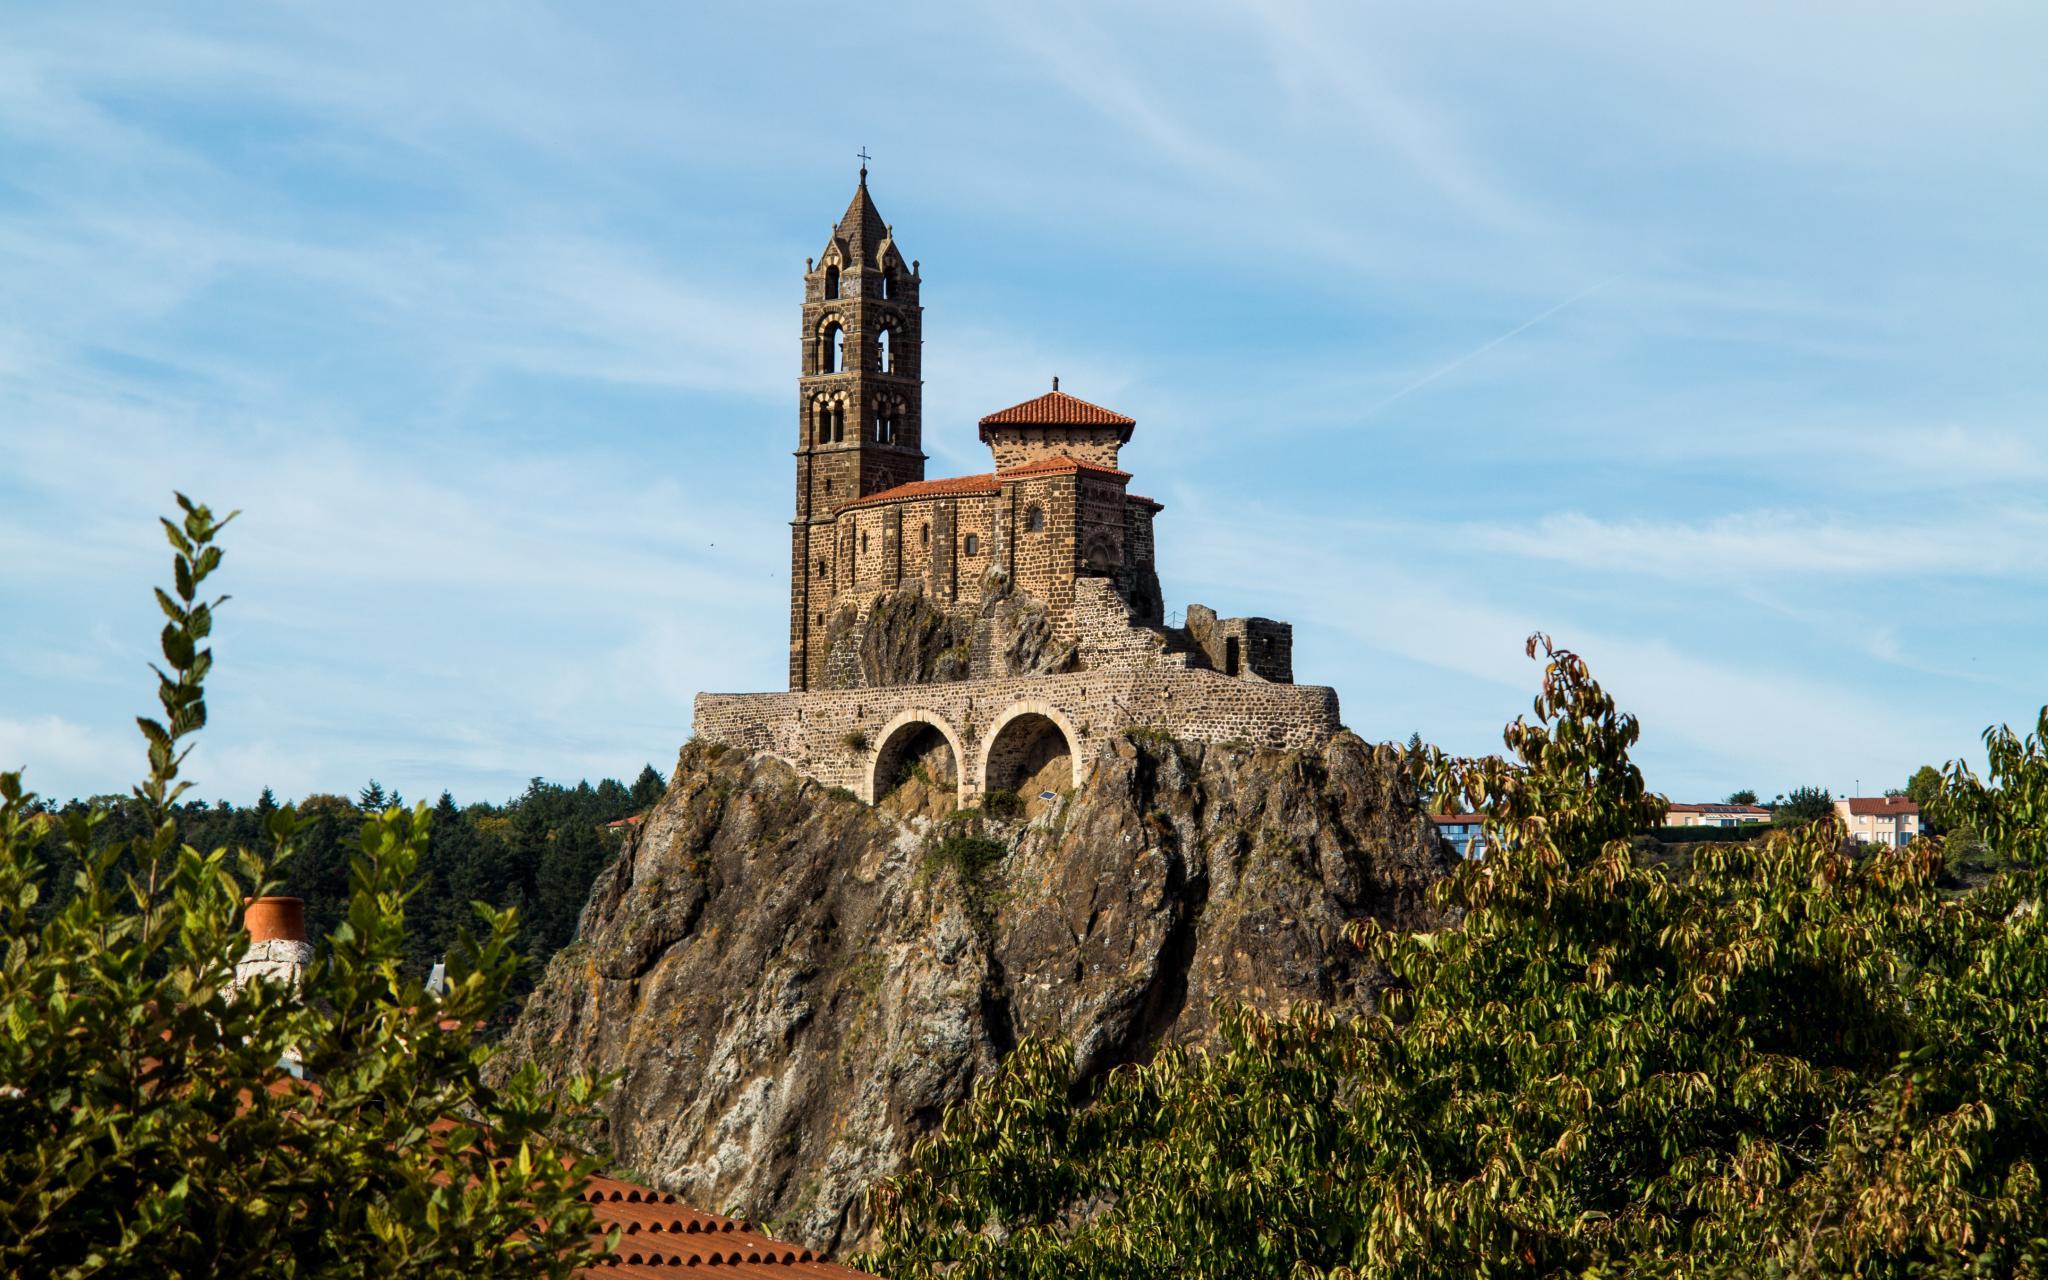 Jakobsweg Le Puy-en-Velay Kirche Saint Michel auf Augenhöhe